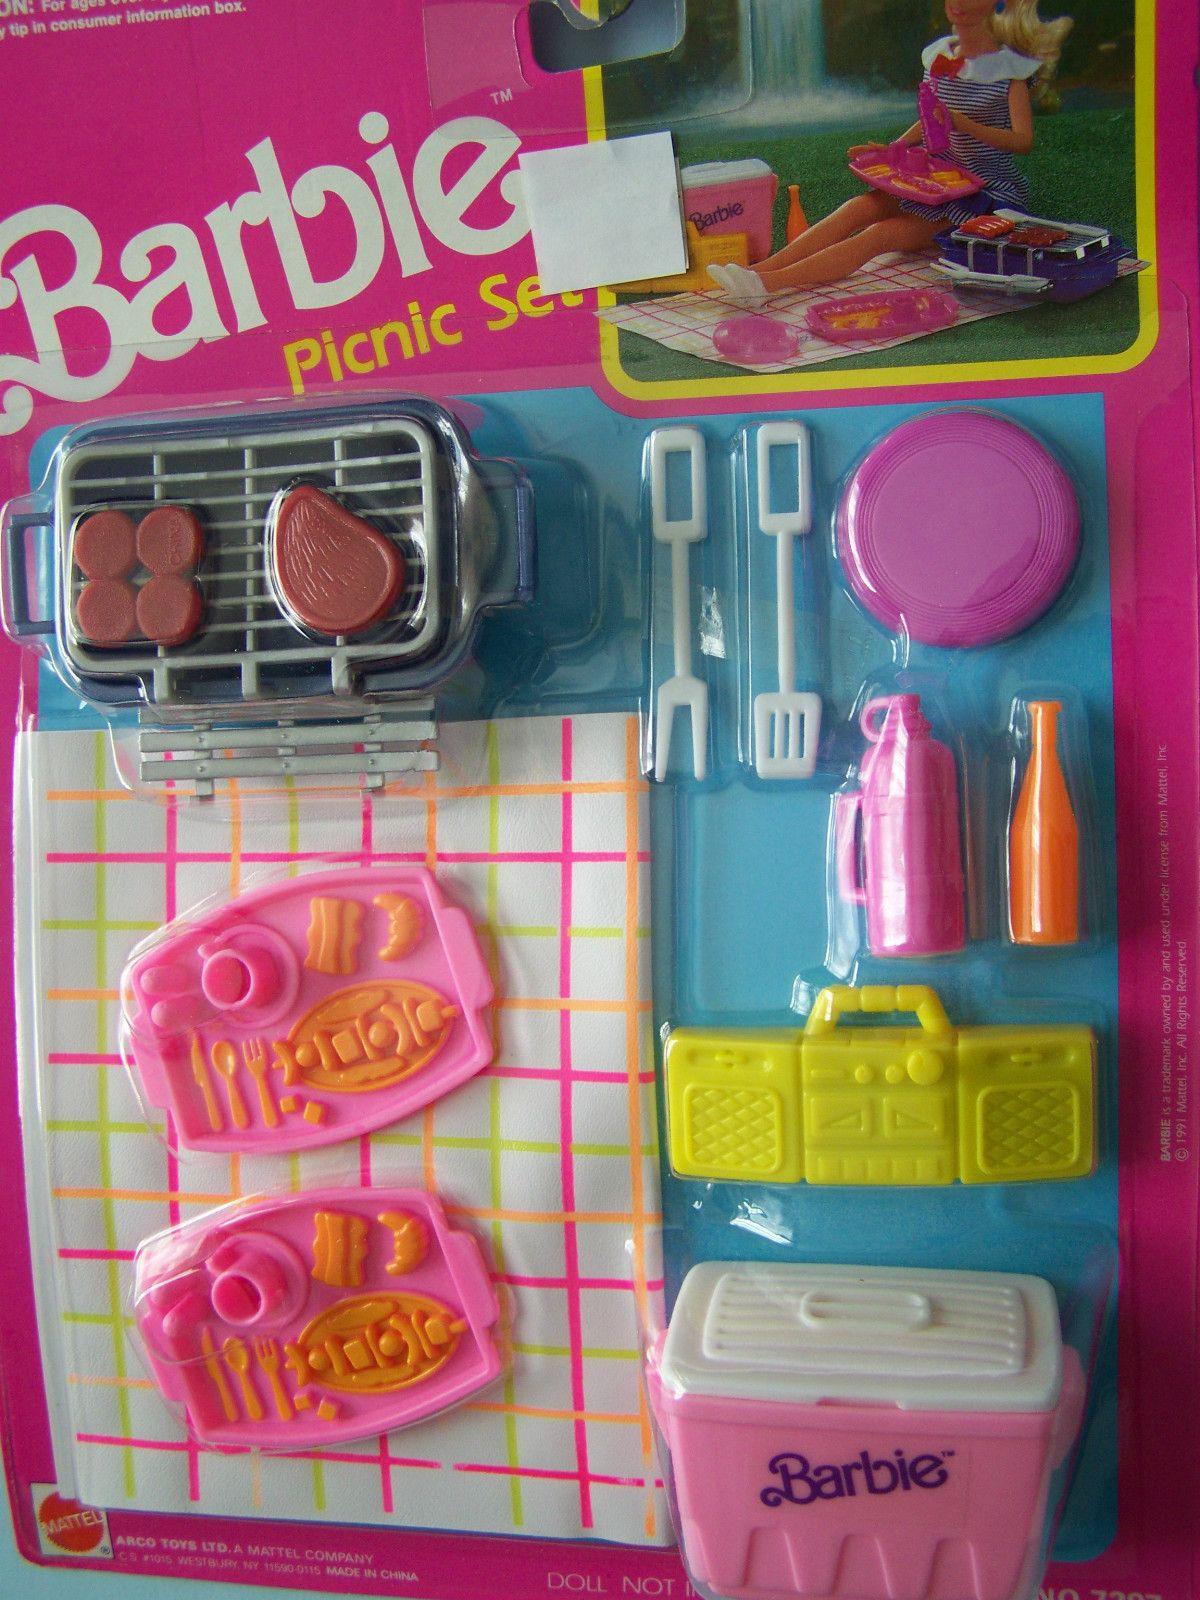 1991 Barbie Picnic Set Accessories Barbie Blast From The Past Pinterest Picnic Set And Barbie